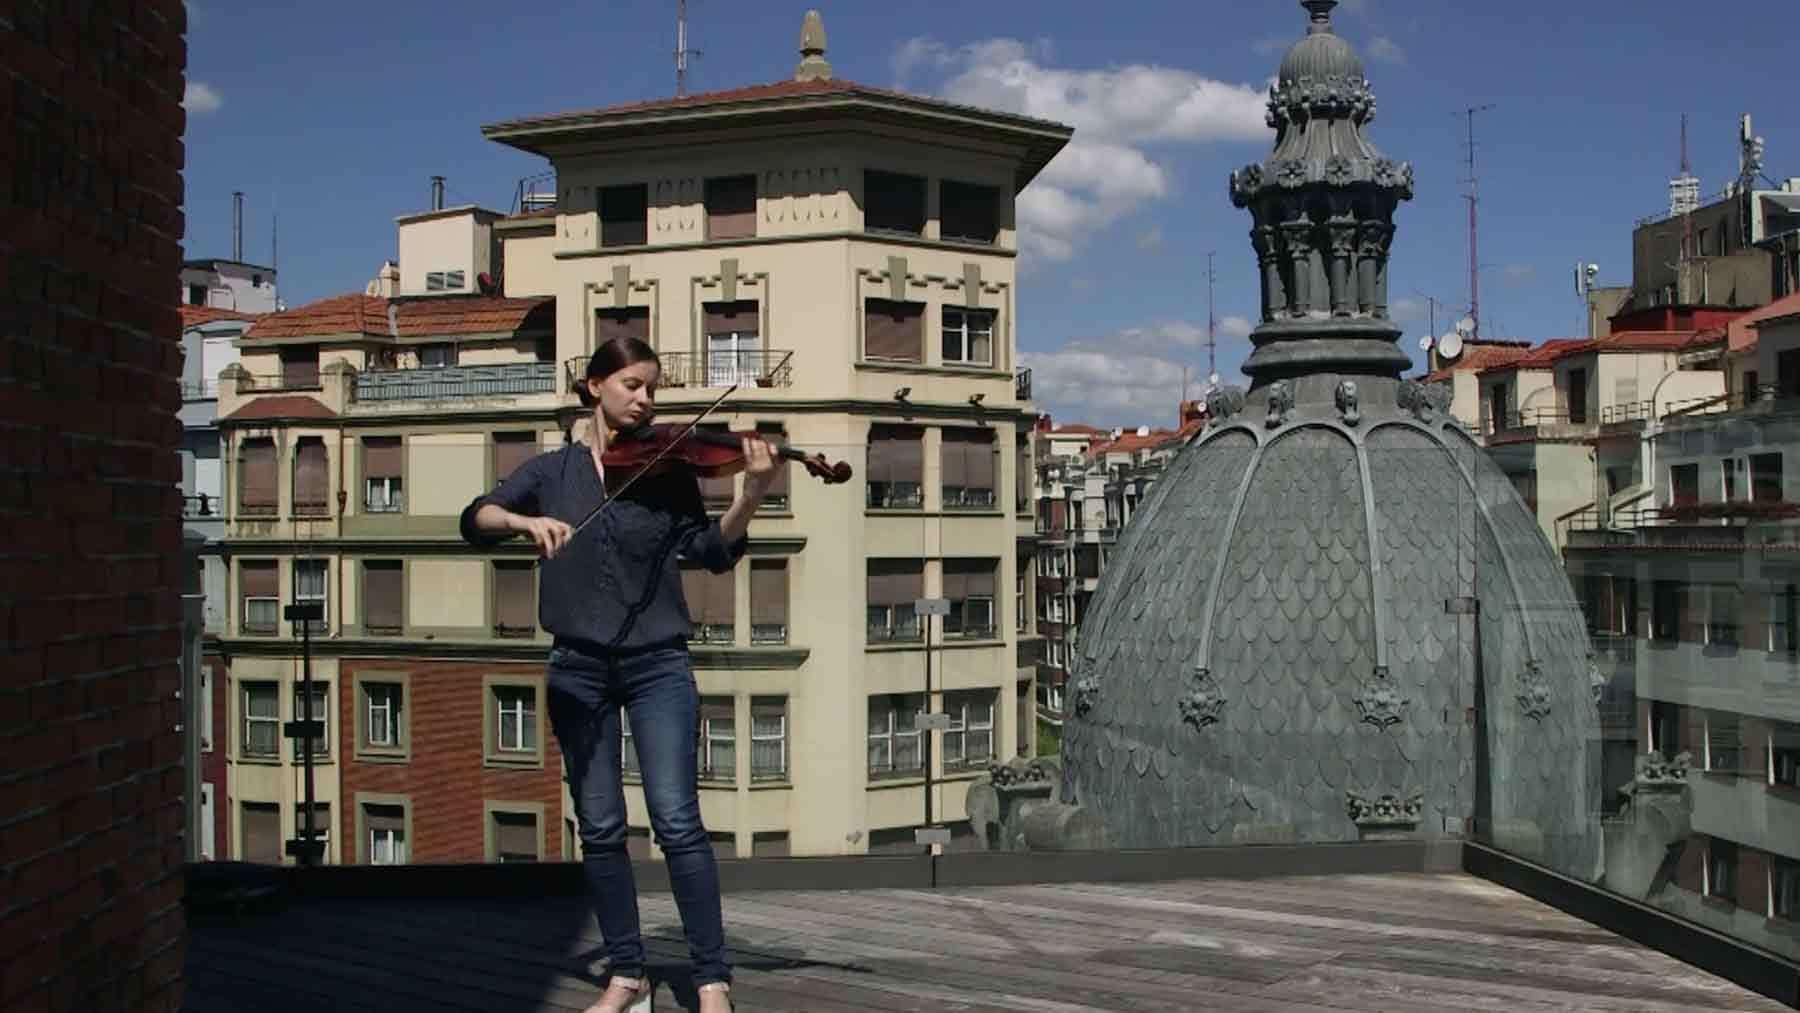 Video screenshot of street musicians performing as part of Carlos Garaicoa's Partitura. © Carlos Garaicoa.